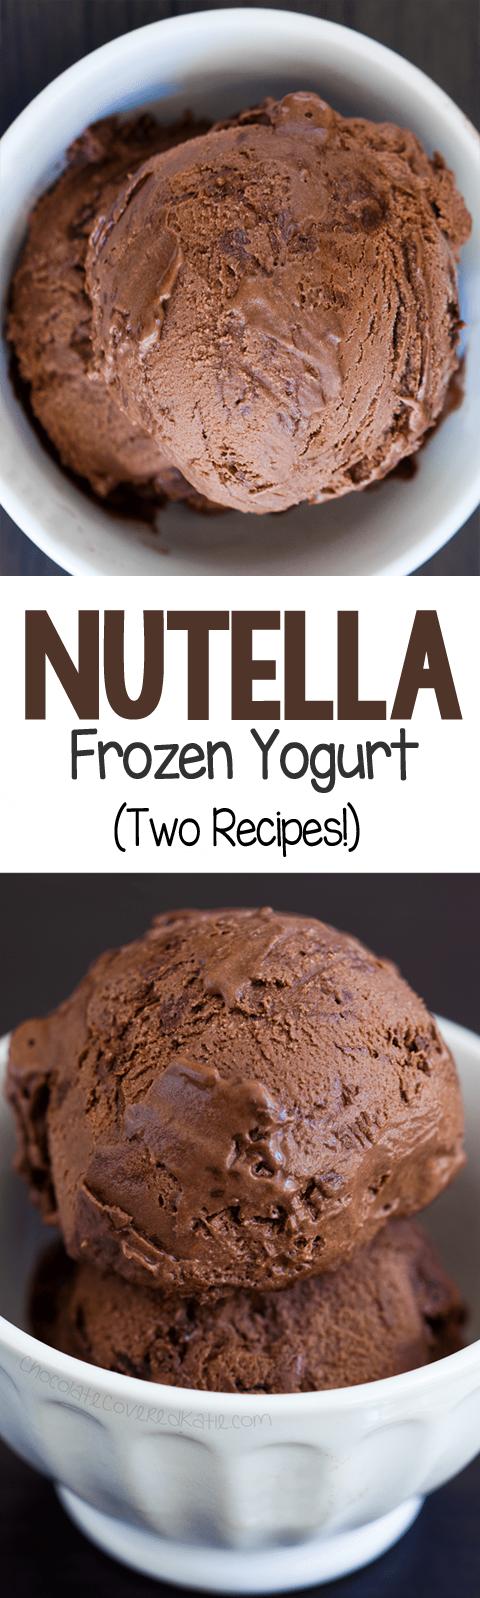 Ultra CREAMY Nutella Frozen Yogurt!